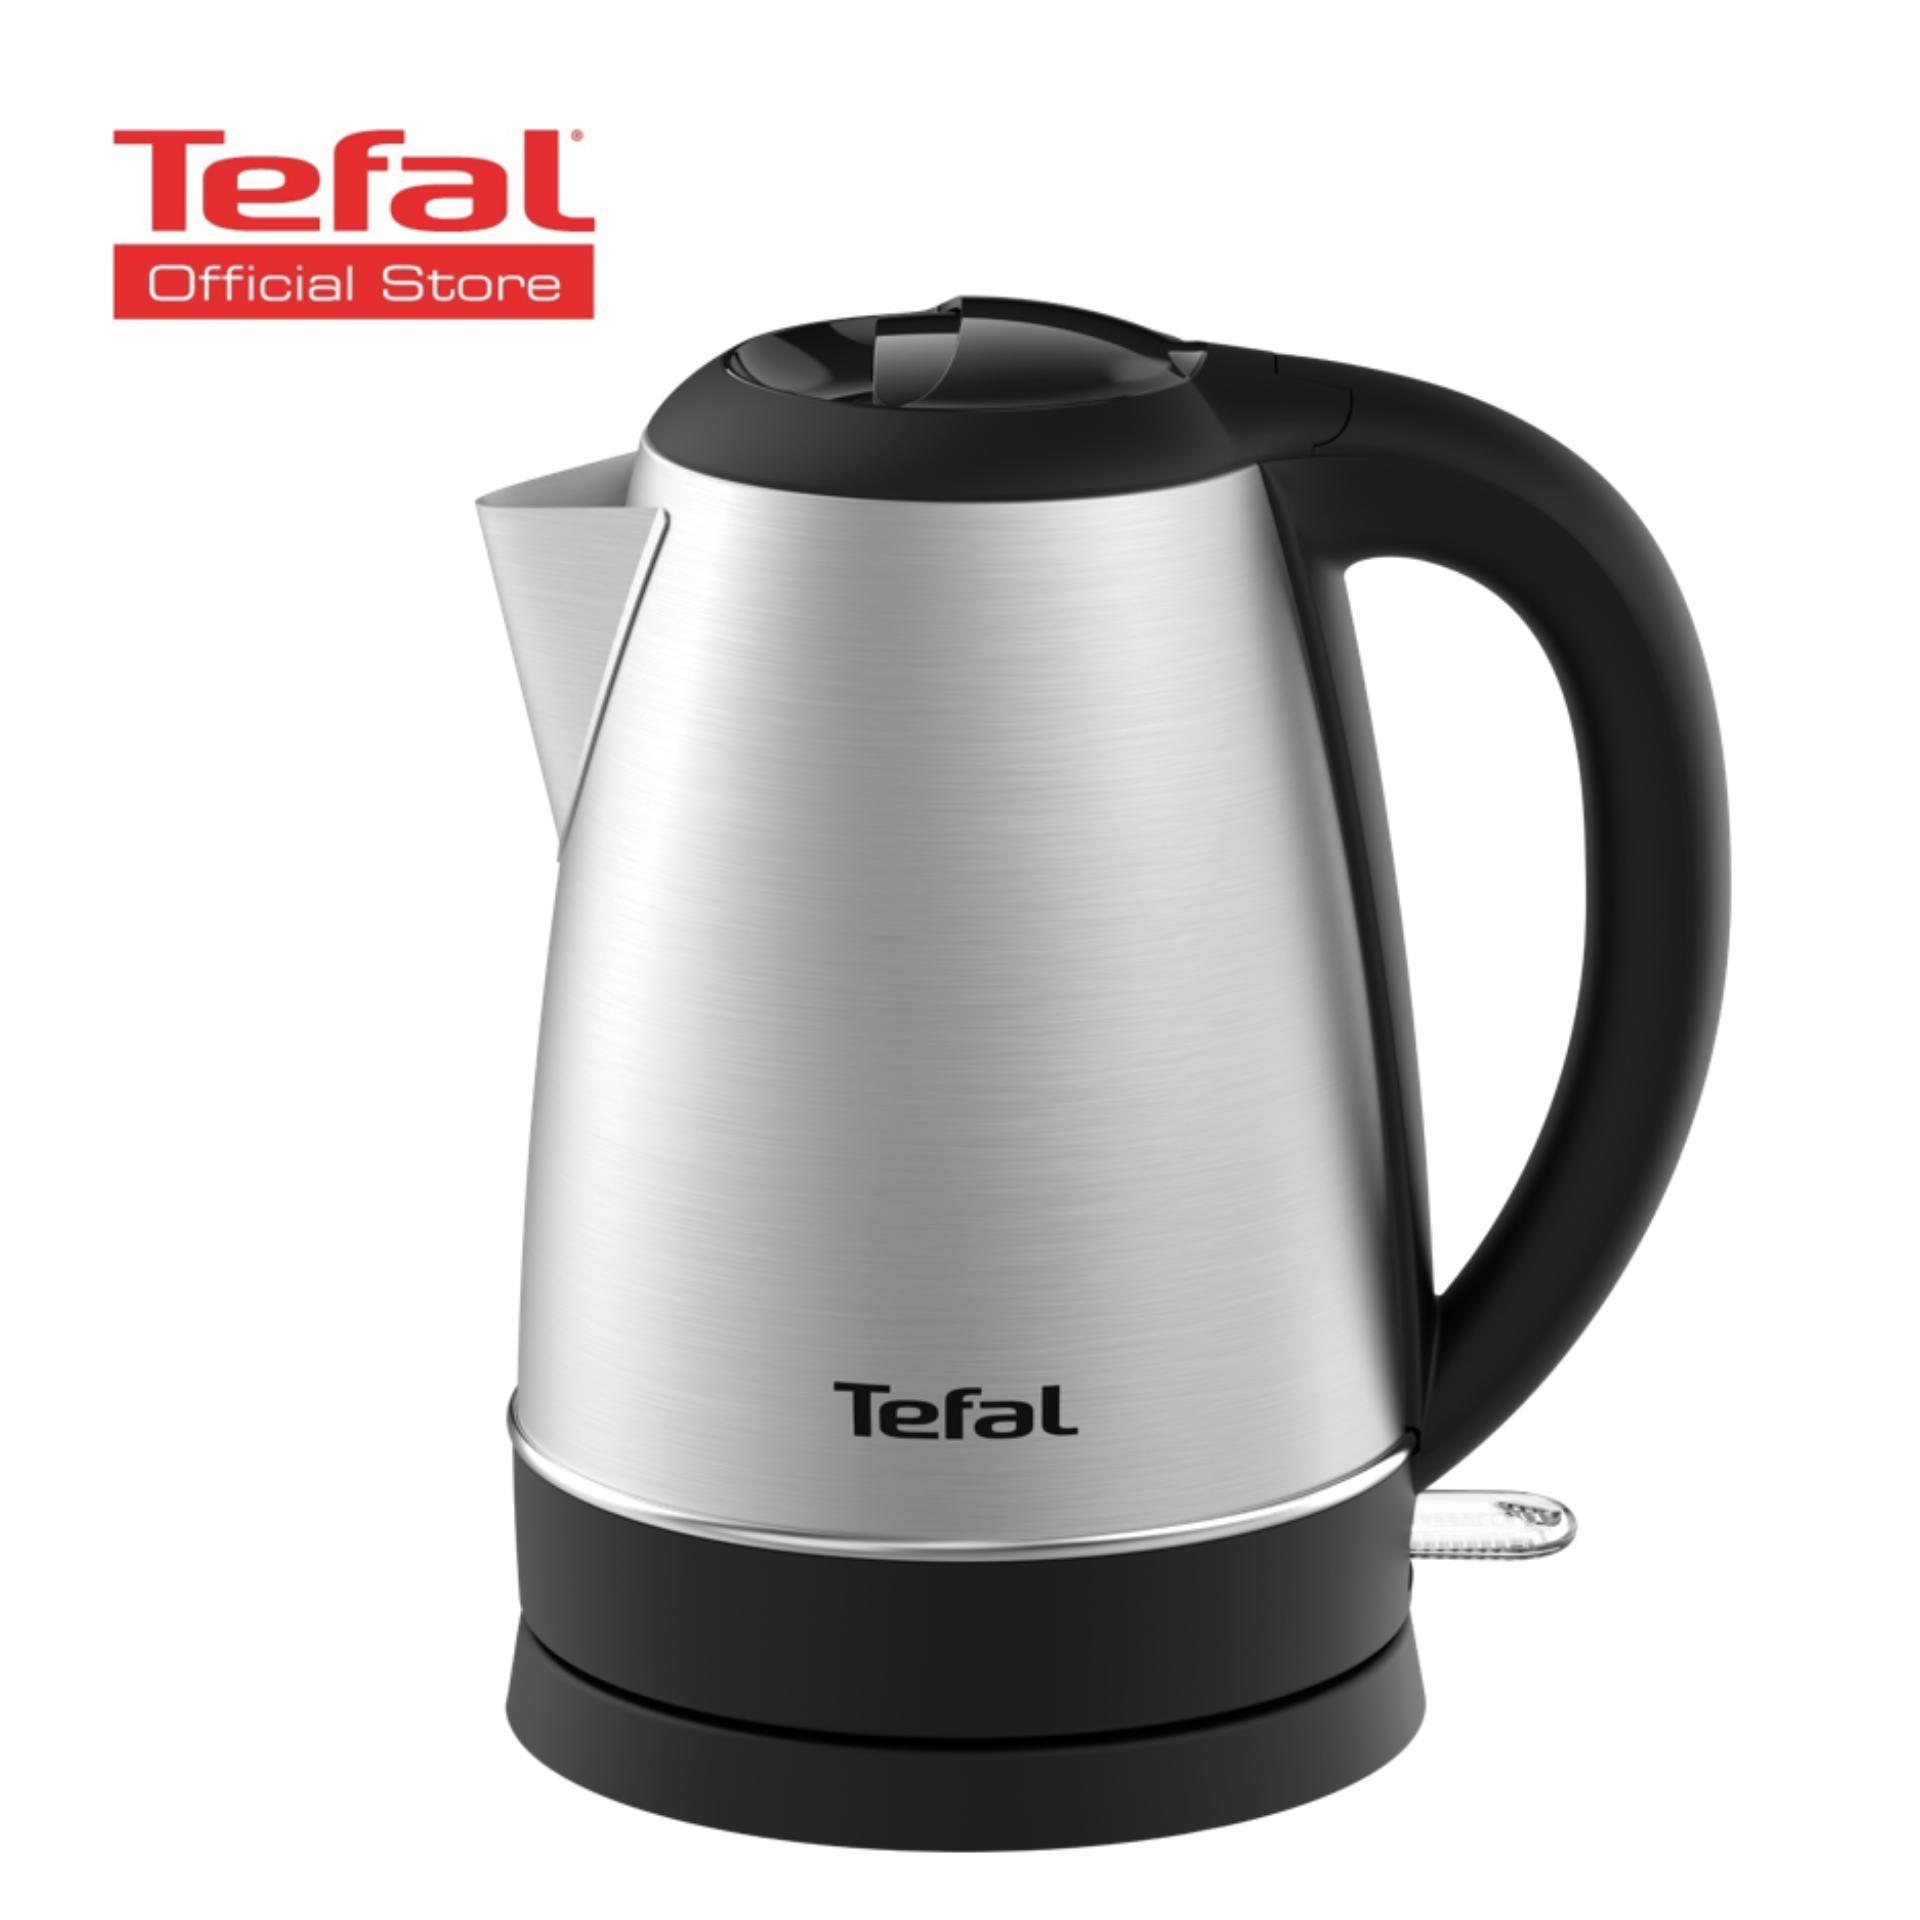 Tefal Handy Kettle Stainless Steel